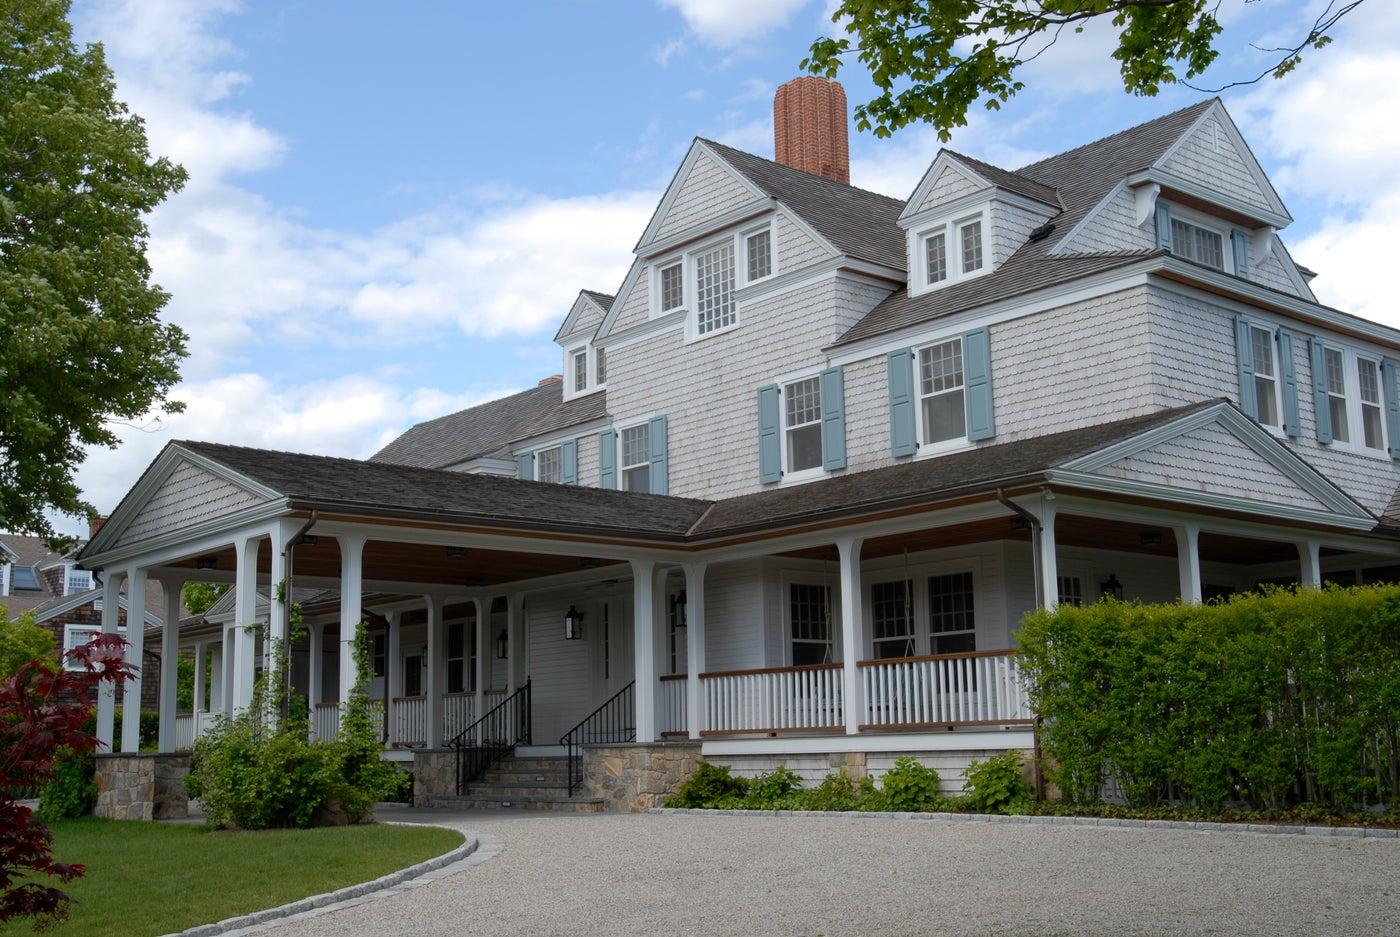 Shingle Style Residence in Watch Hill, RI